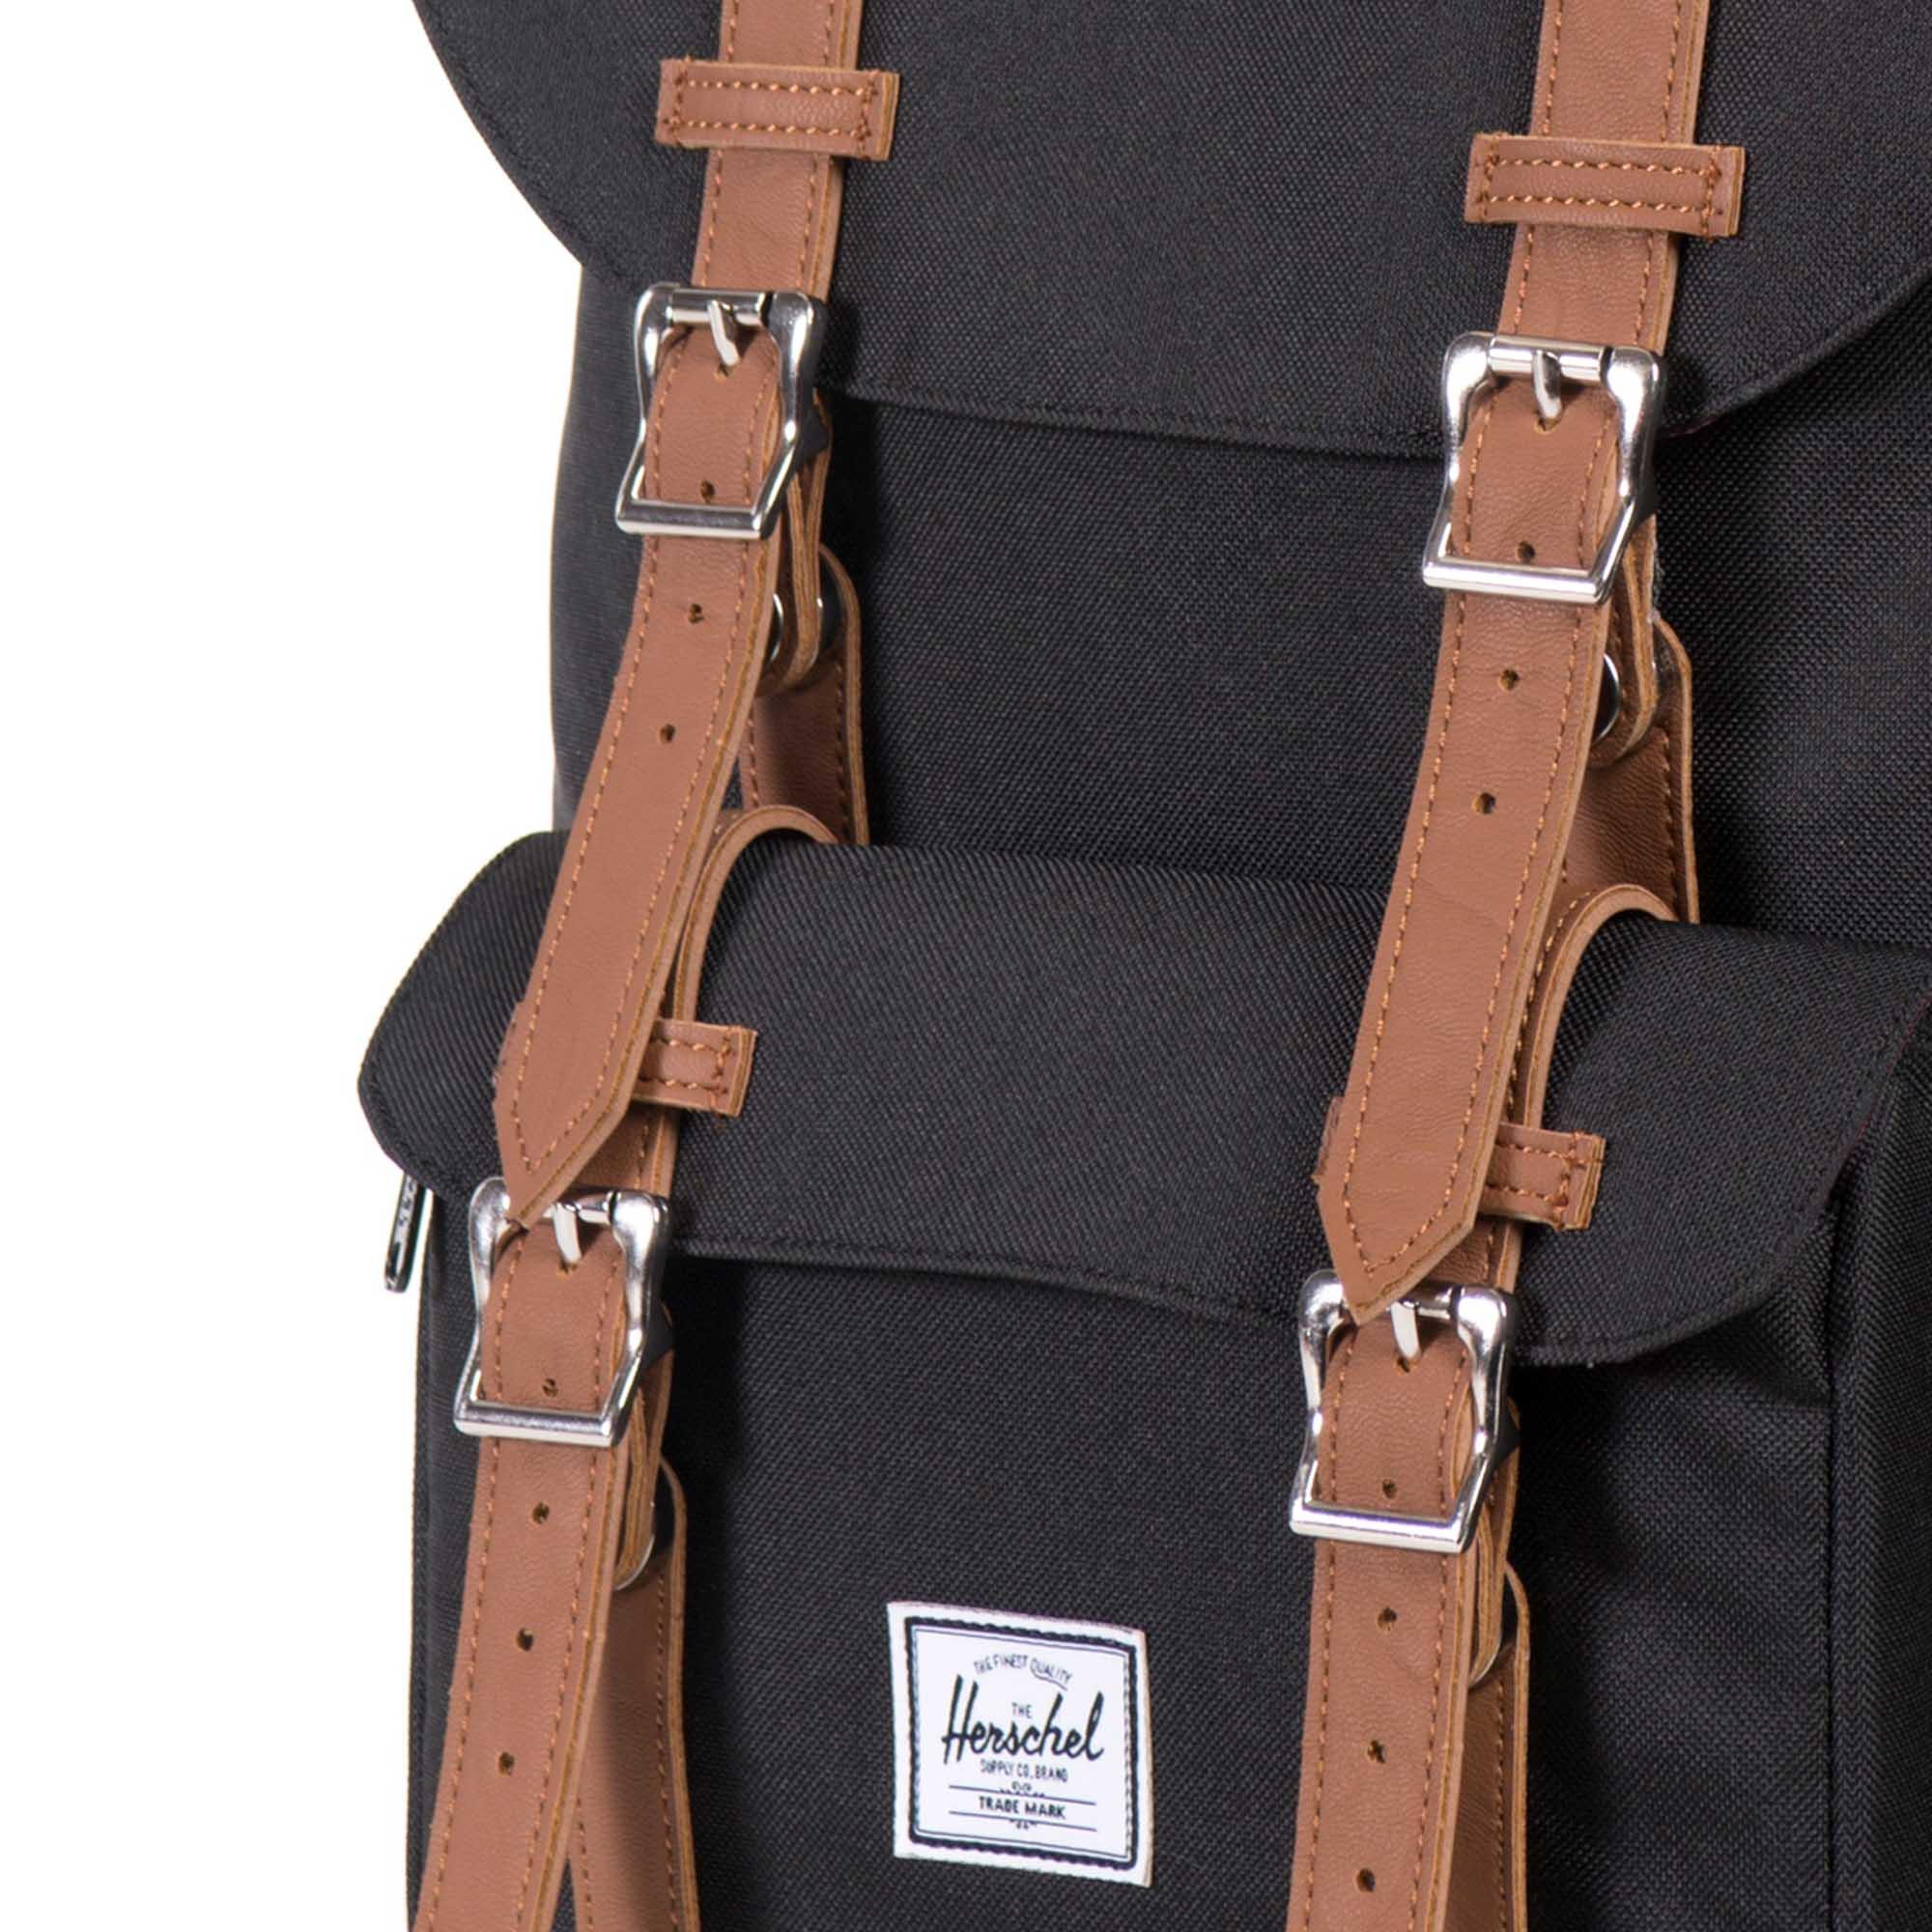 Herschel - Backpack - Little America - Eclipse Crosshatch - Overload cc2824019a024